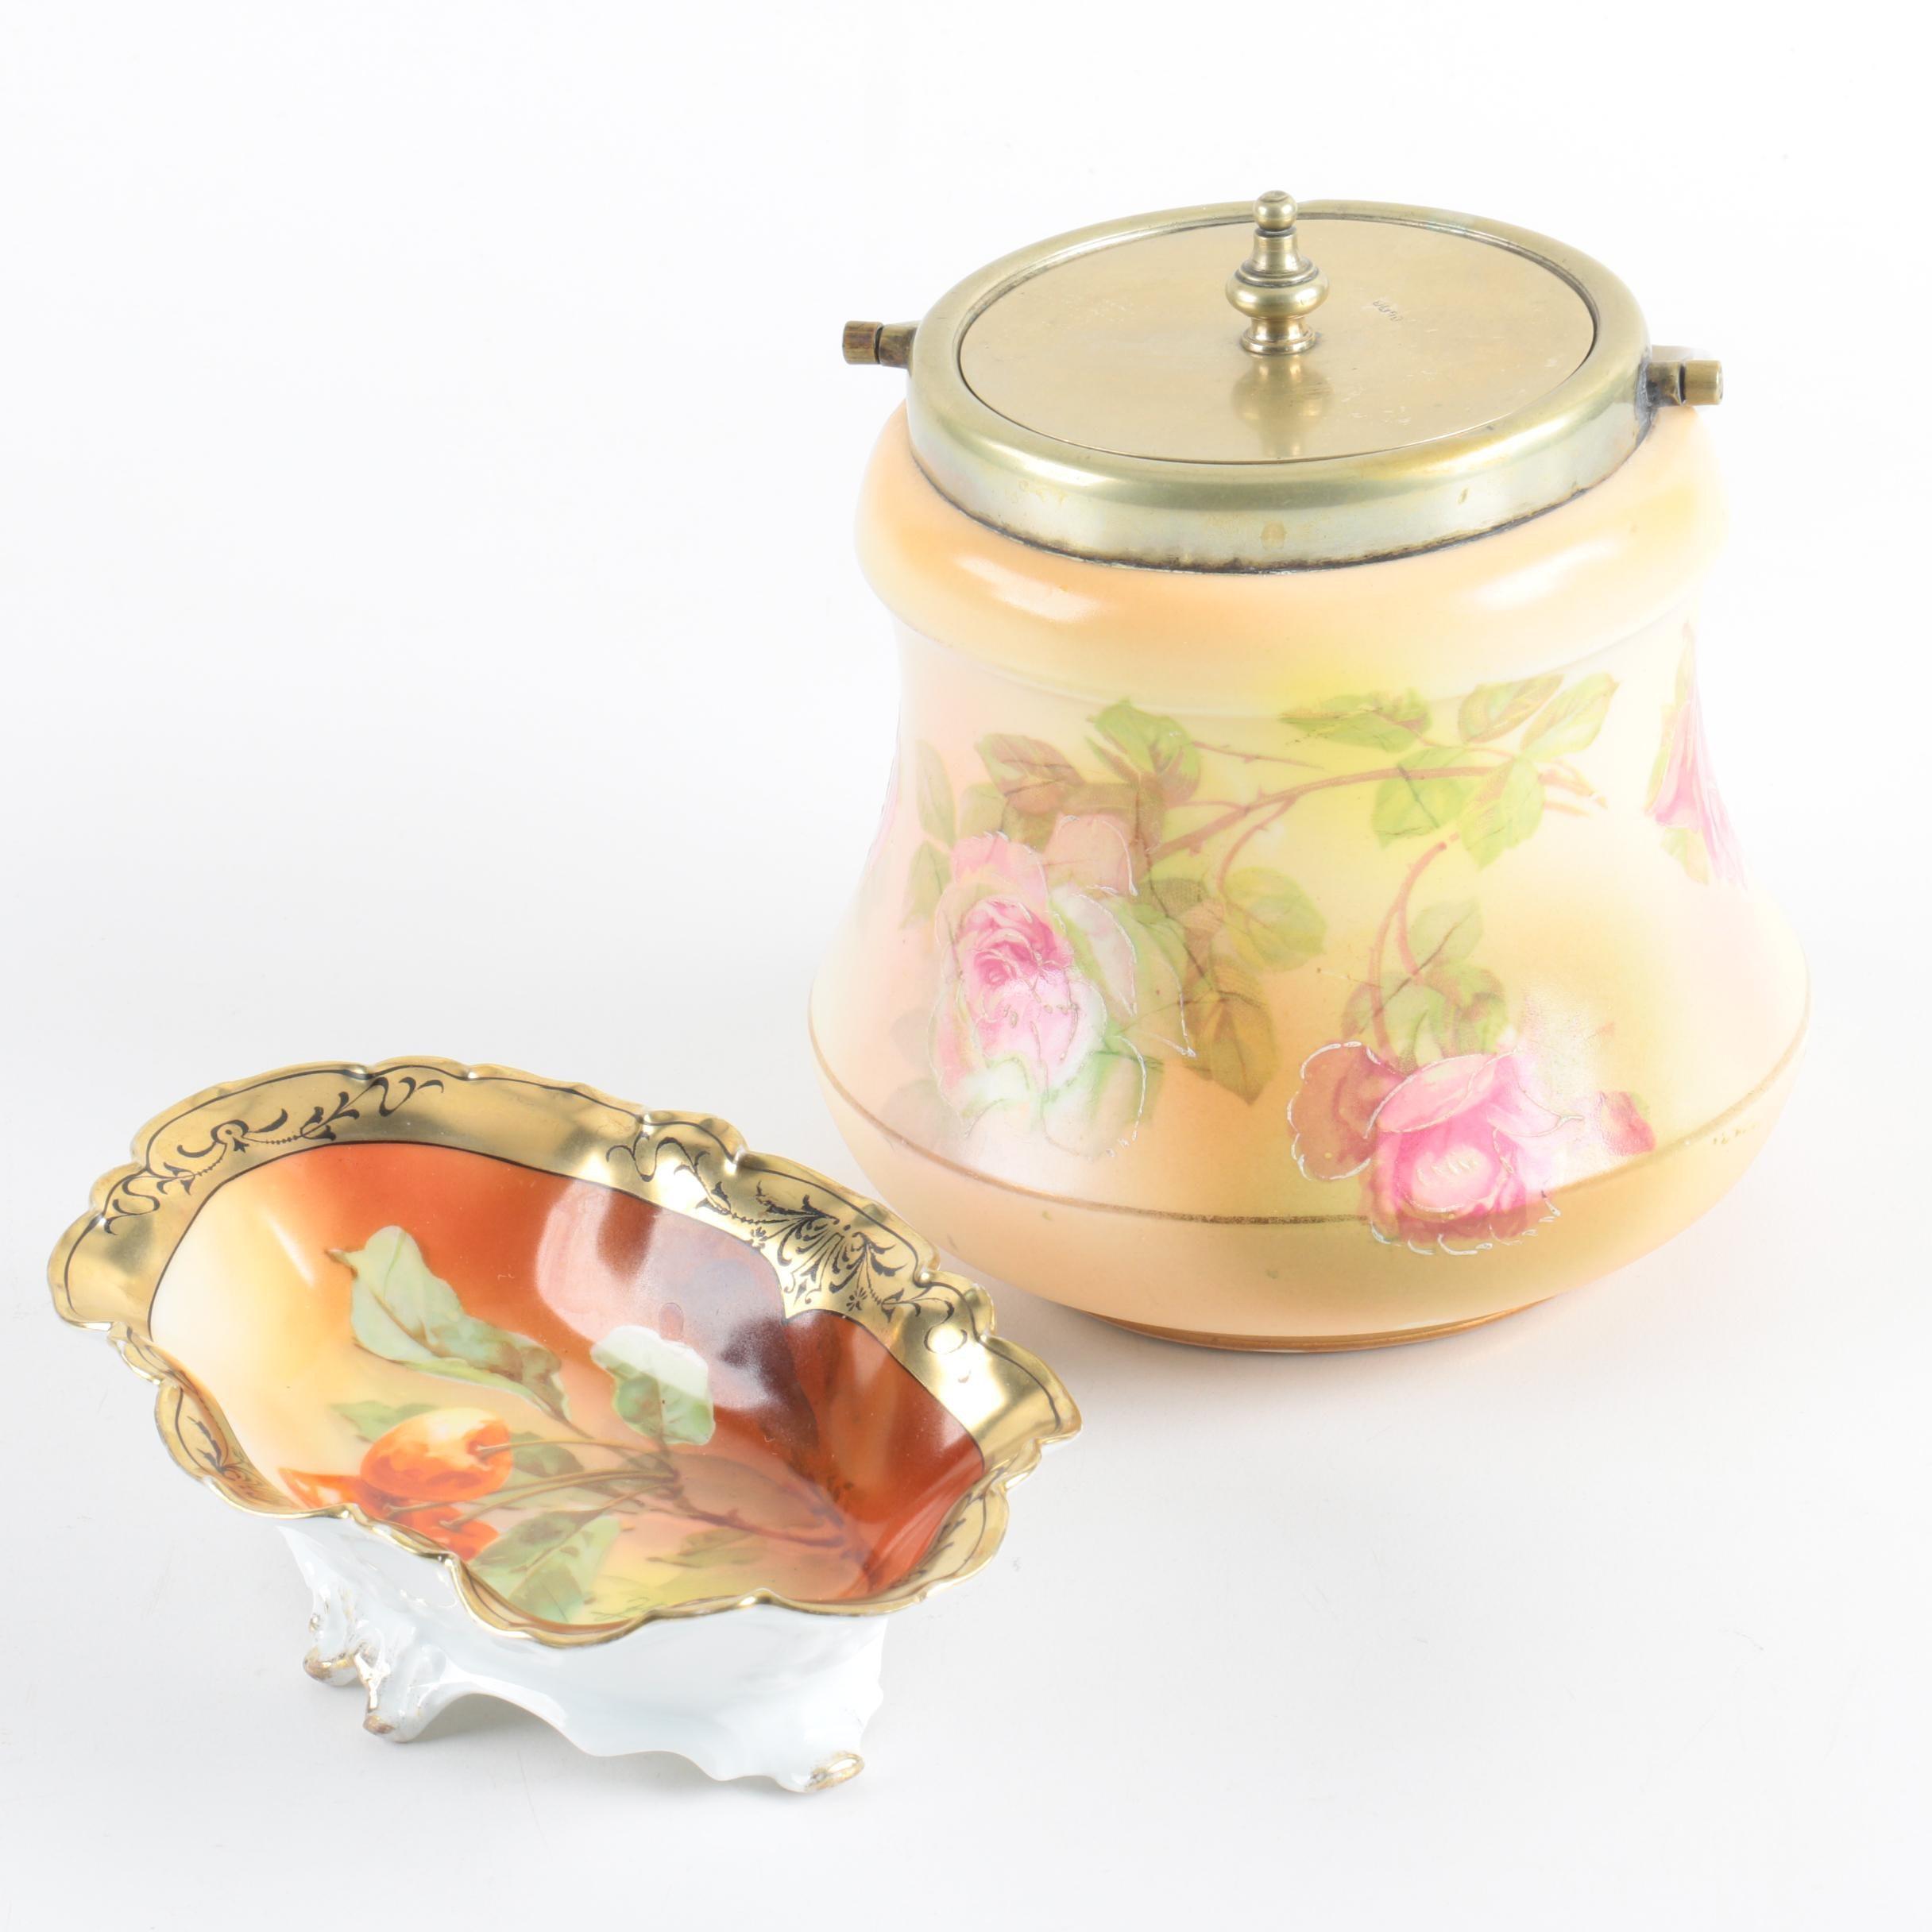 Porcelain Biscuit Jar with Silver Plate Lid and Tirschenreuth Porcelain Dish